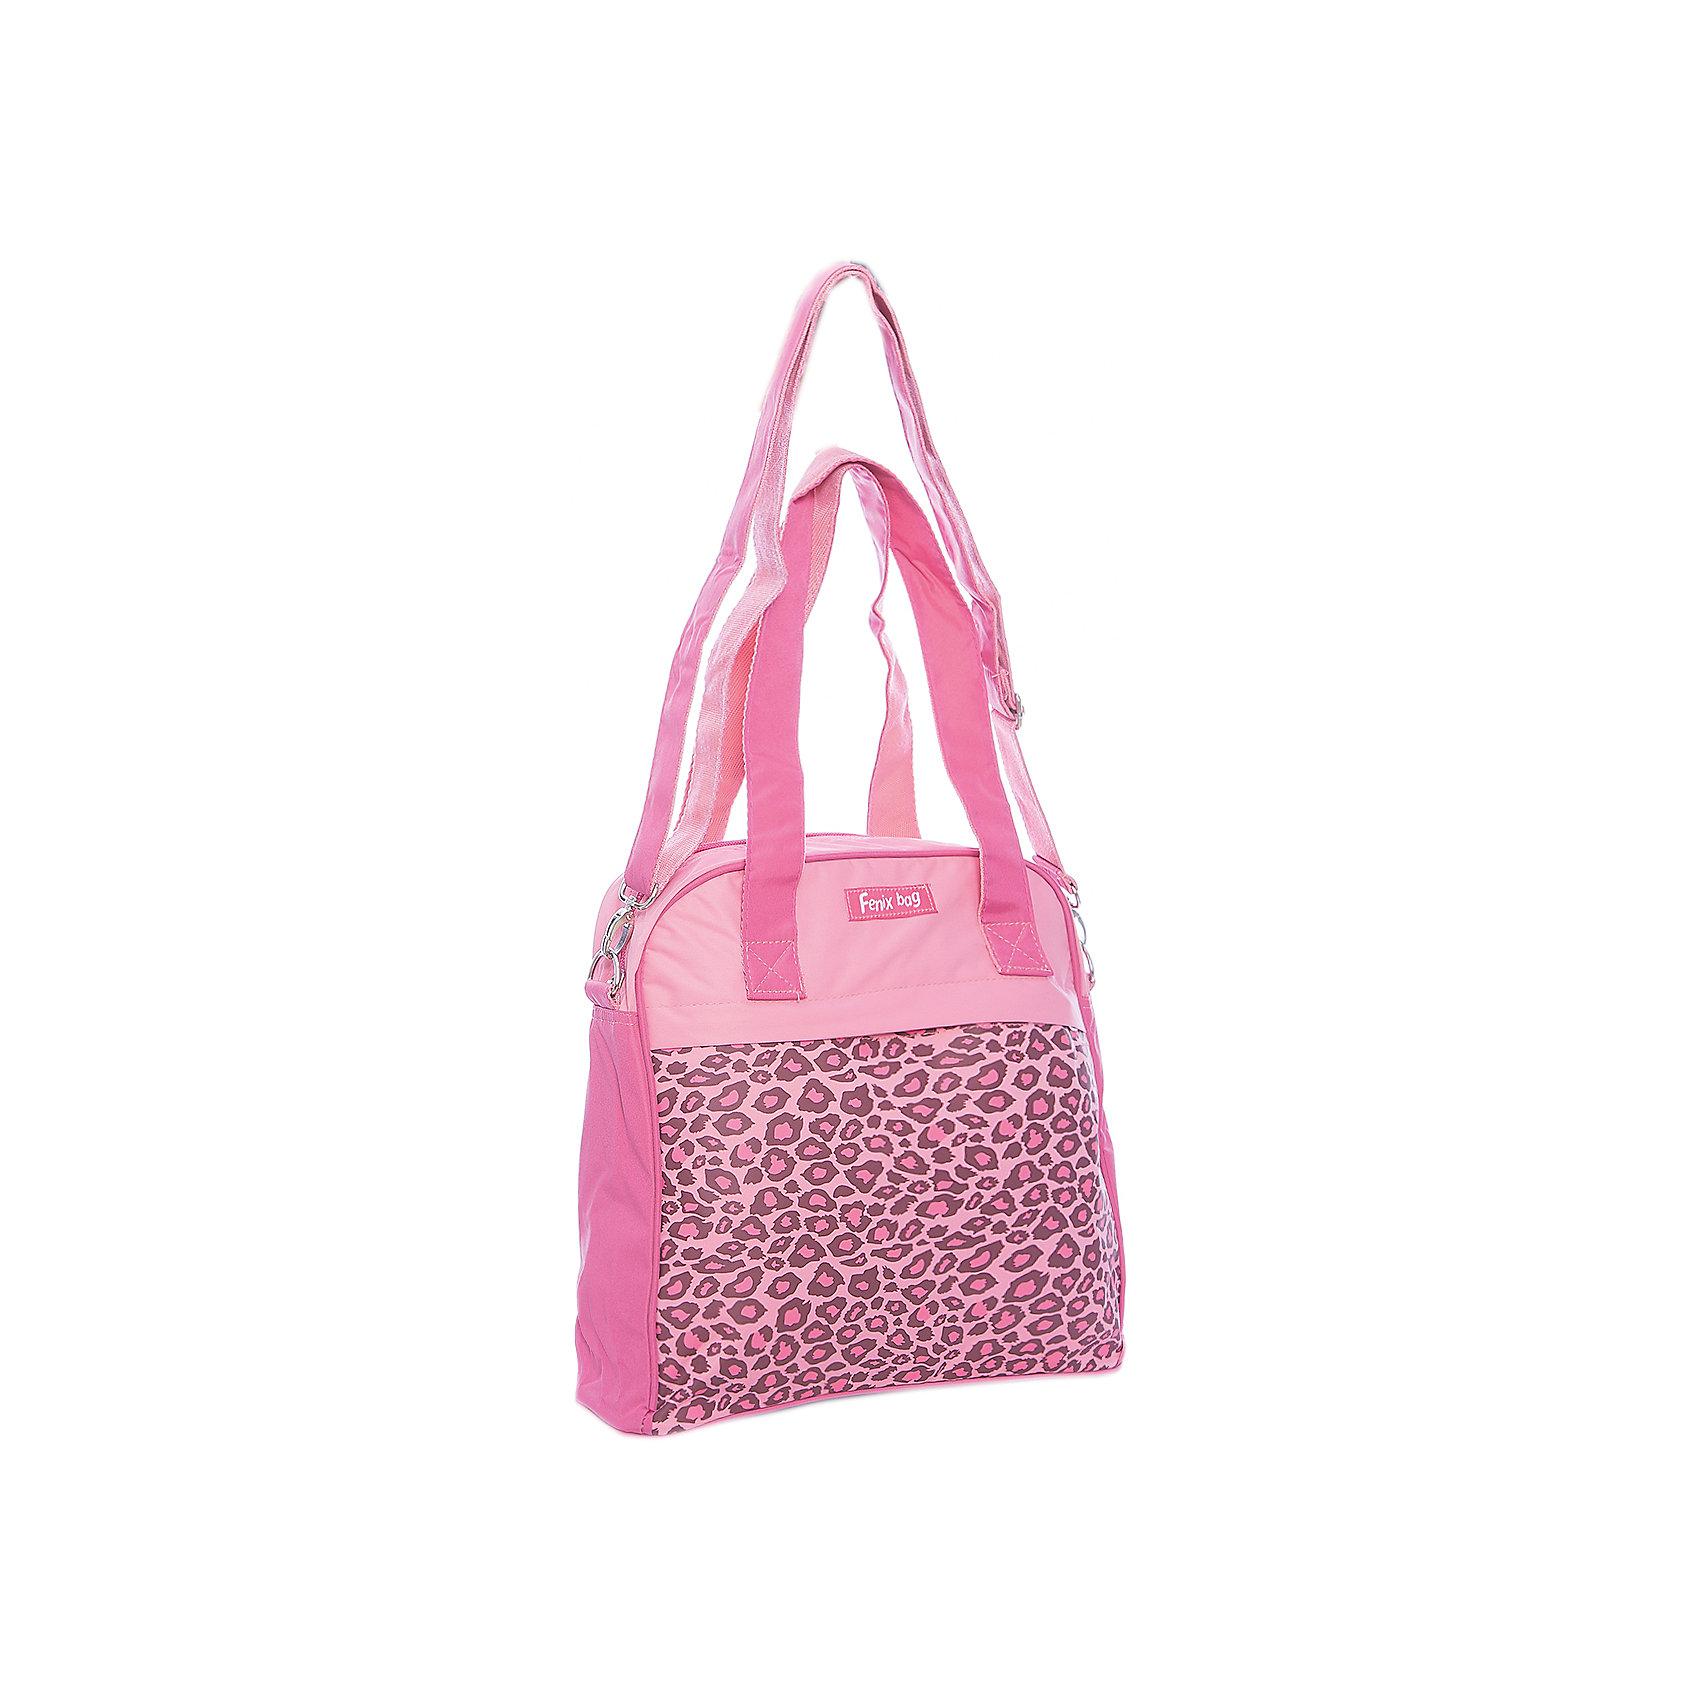 Сумка Принт леопард Феникс+, розоваяДетские сумки<br>Сумка д/девочек ПРИНТ ЛЕОПАРД (РОЗОВАЯ) (31х29х10см, полиэстер, запечатка, ручки, регулир. плечевой ремень, карманы)<br><br>Ширина мм: 310<br>Глубина мм: 290<br>Высота мм: 100<br>Вес г: 305<br>Возраст от месяцев: 72<br>Возраст до месяцев: 2147483647<br>Пол: Женский<br>Возраст: Детский<br>SKU: 7046449